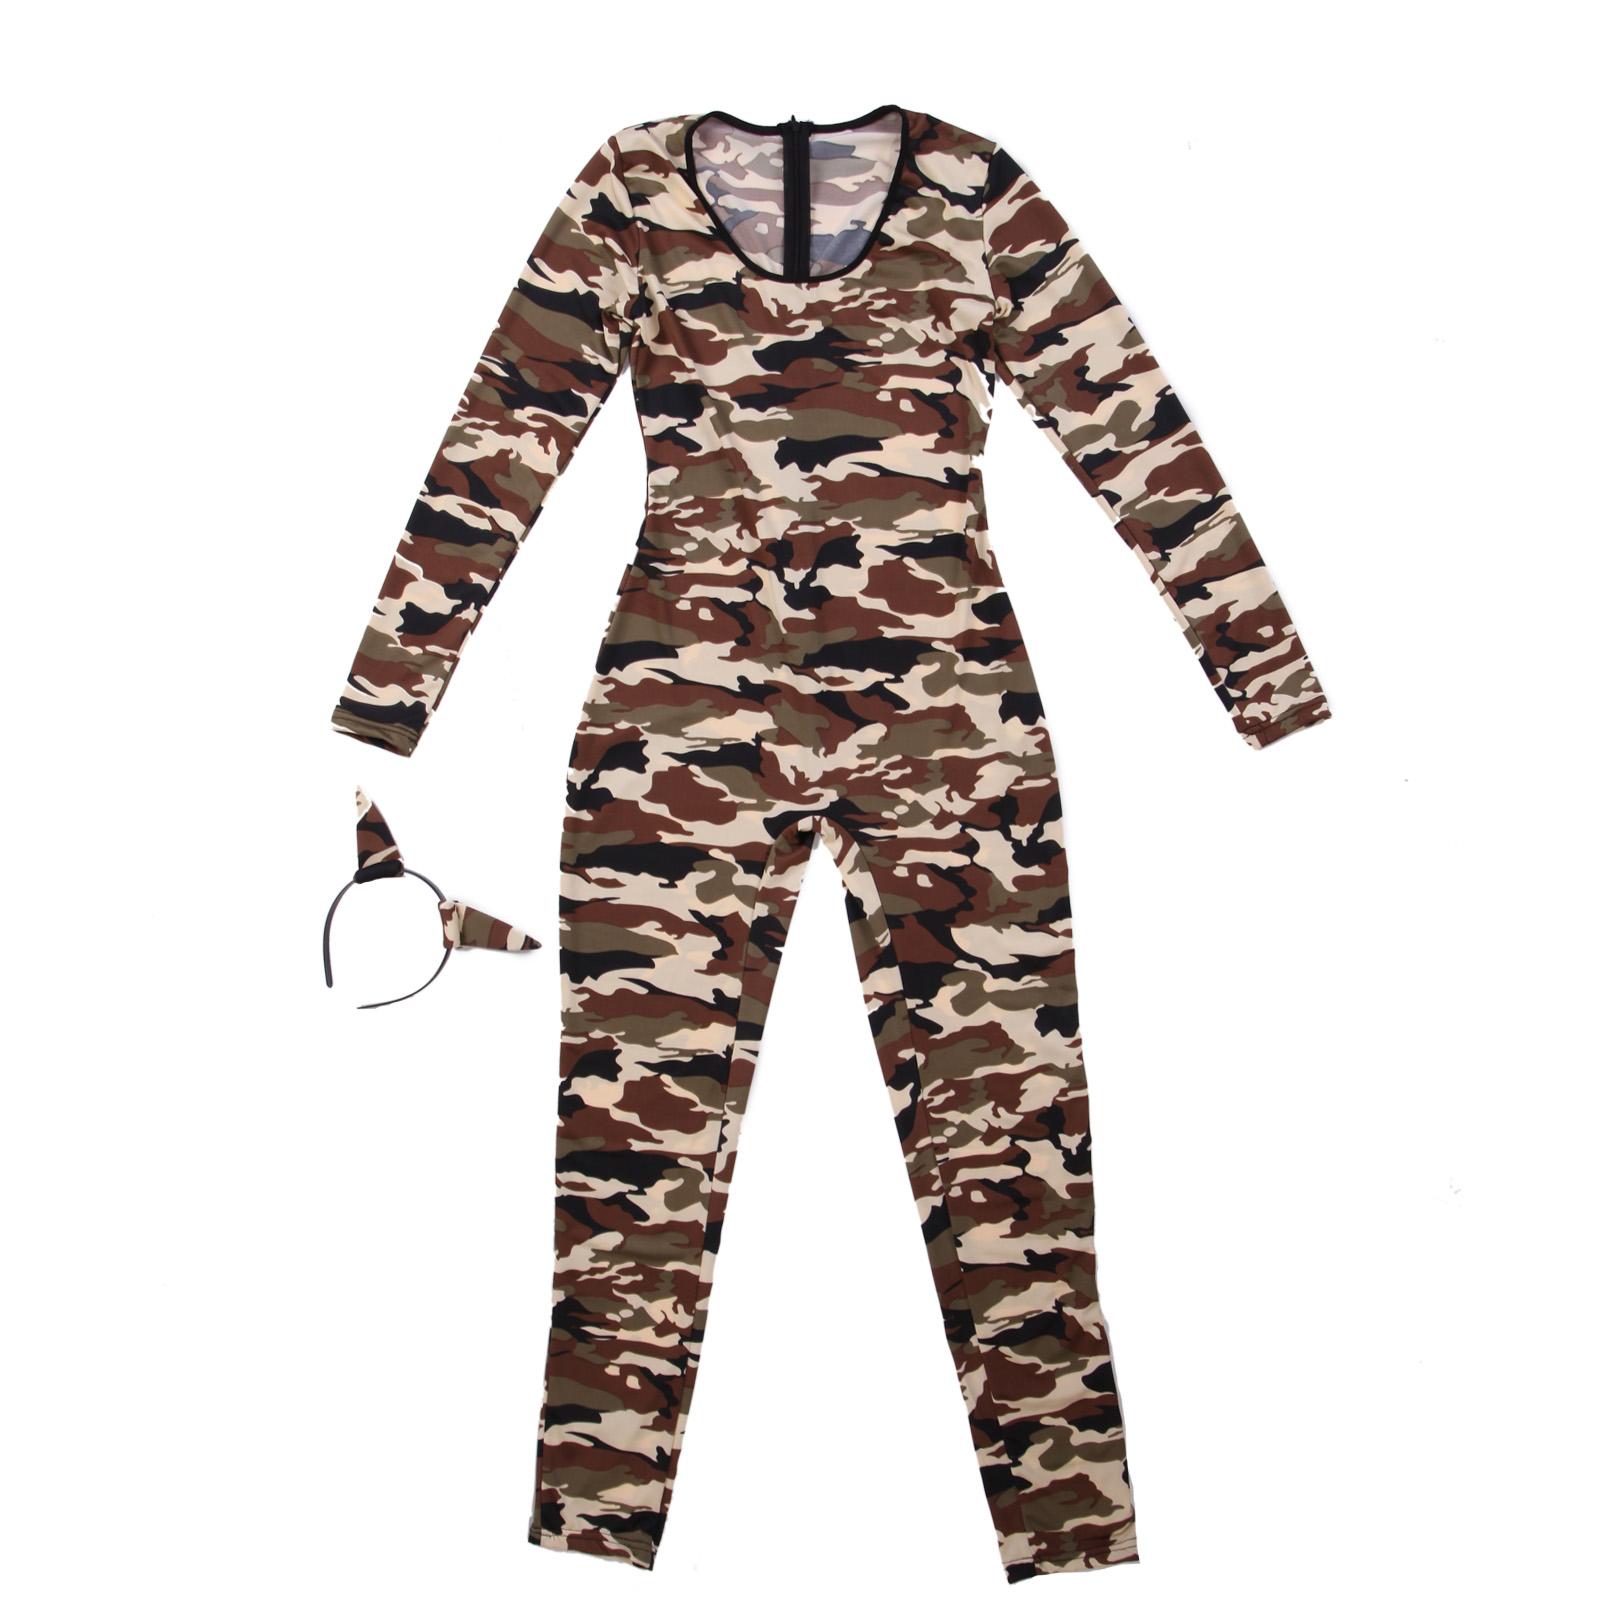 neu frauen tierdruck zebra leopard soldatin armee halloween party kost m overall ebay. Black Bedroom Furniture Sets. Home Design Ideas